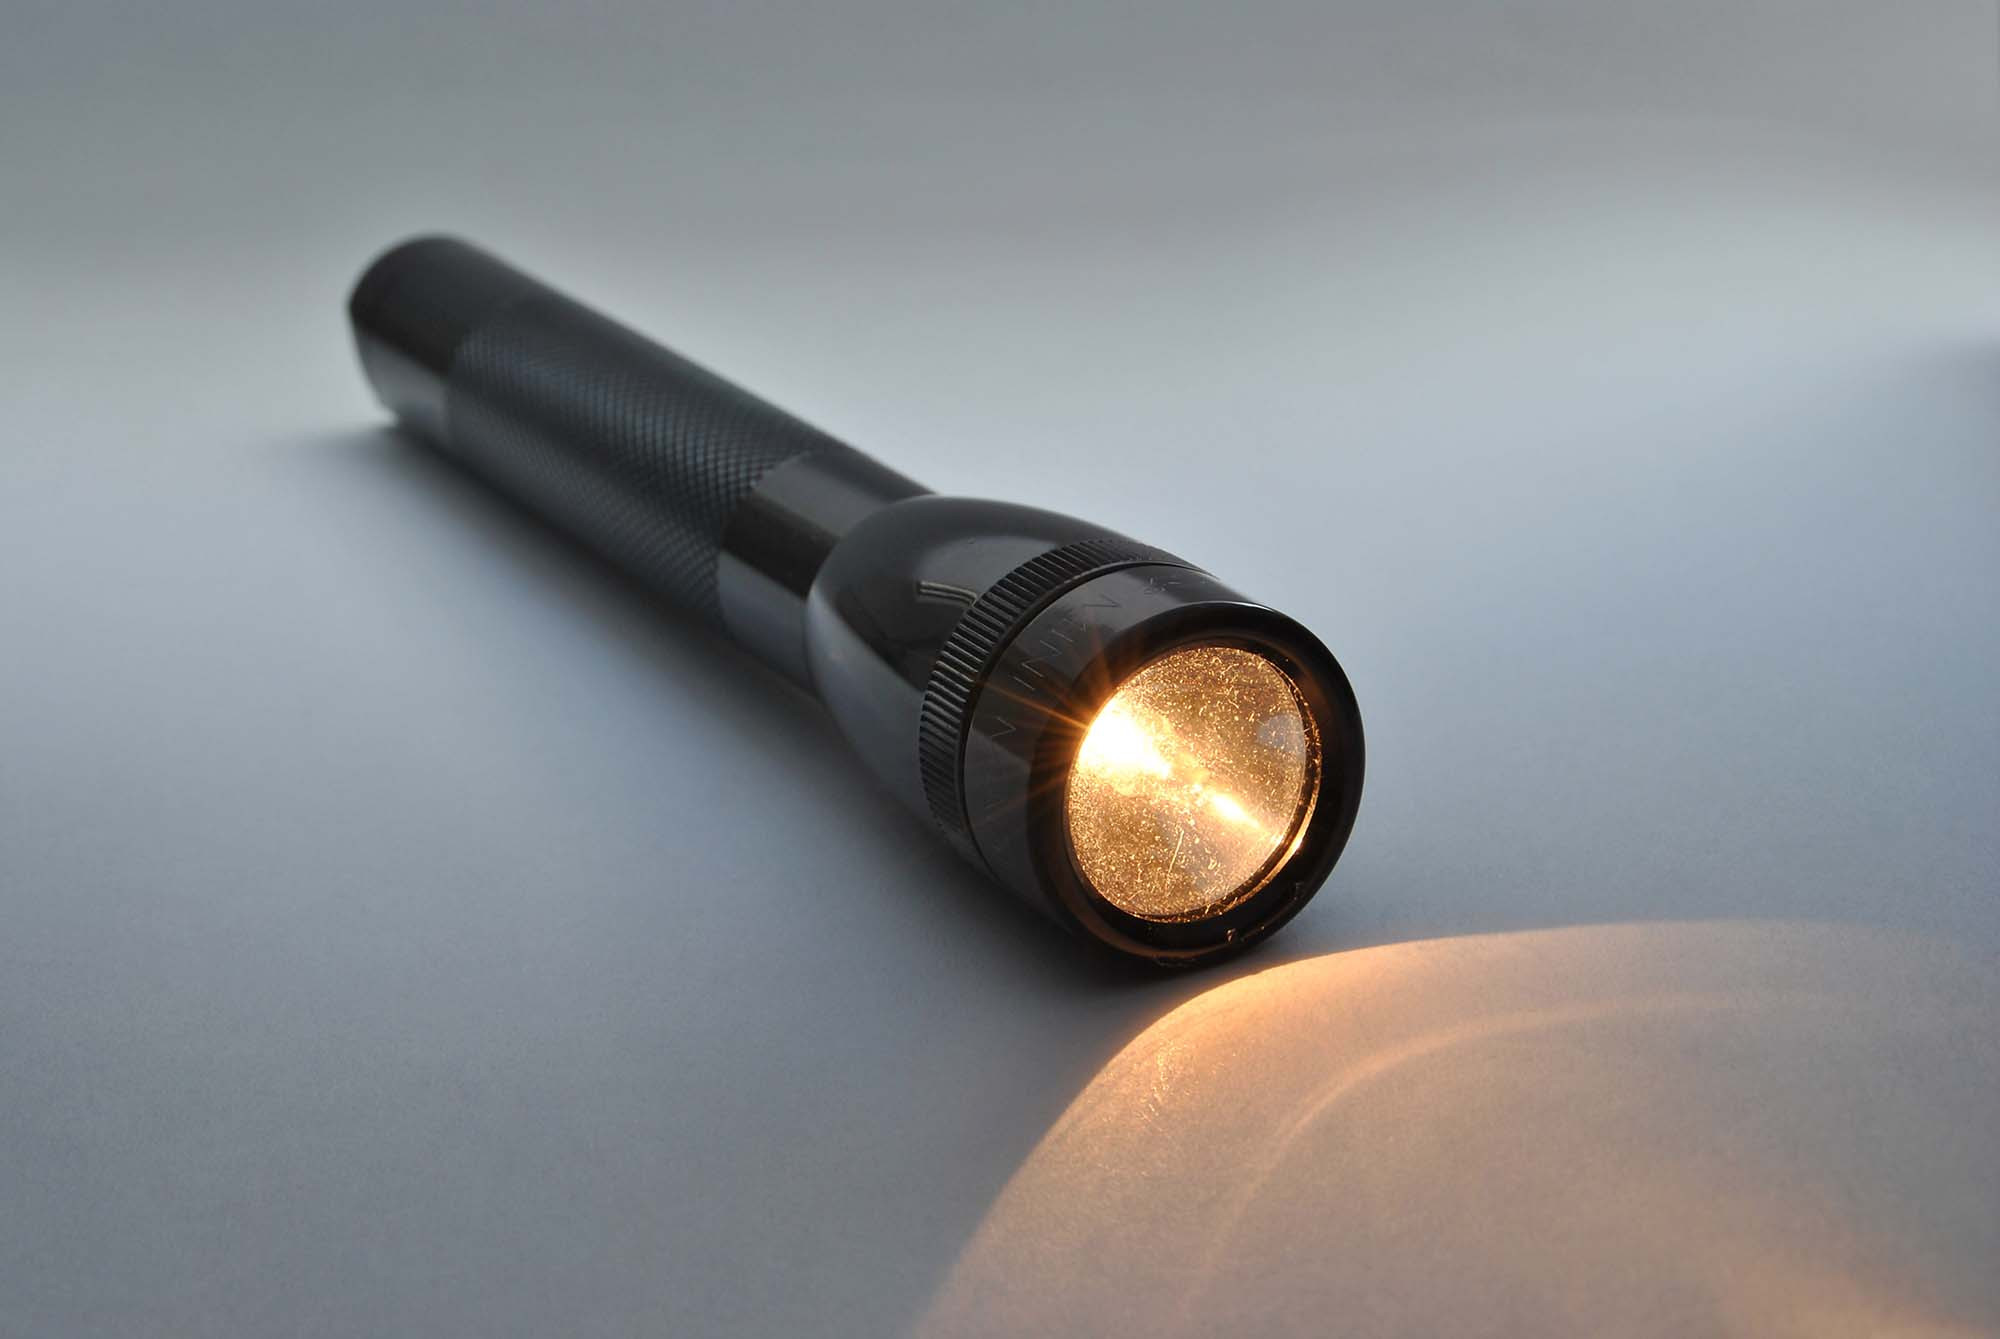 Shining torch